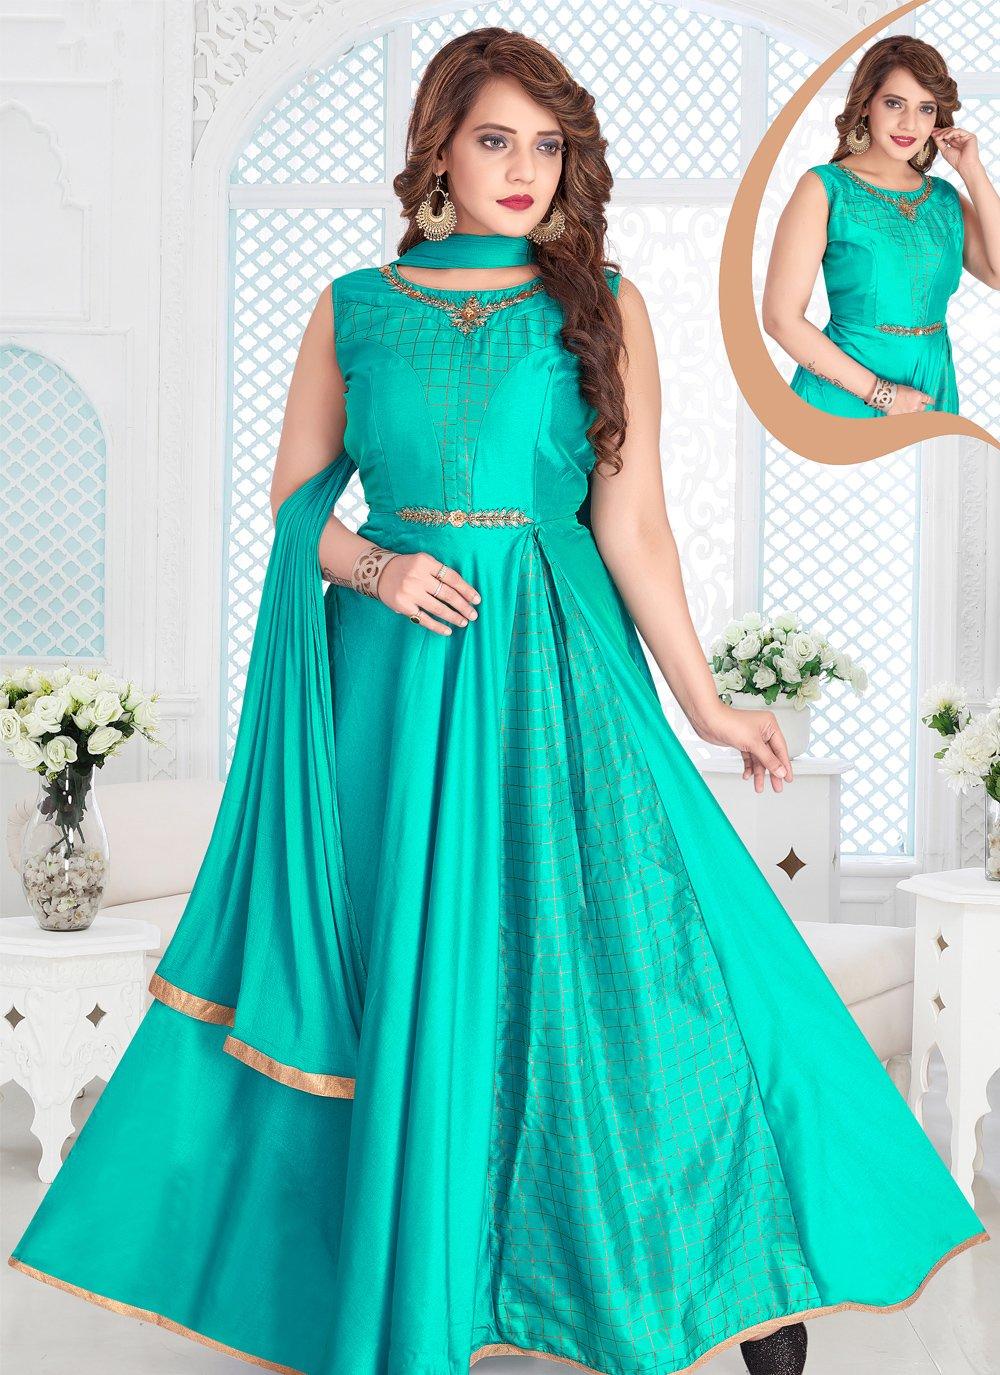 Readymade Anarkali Suit Zari Chanderi in Turquoise